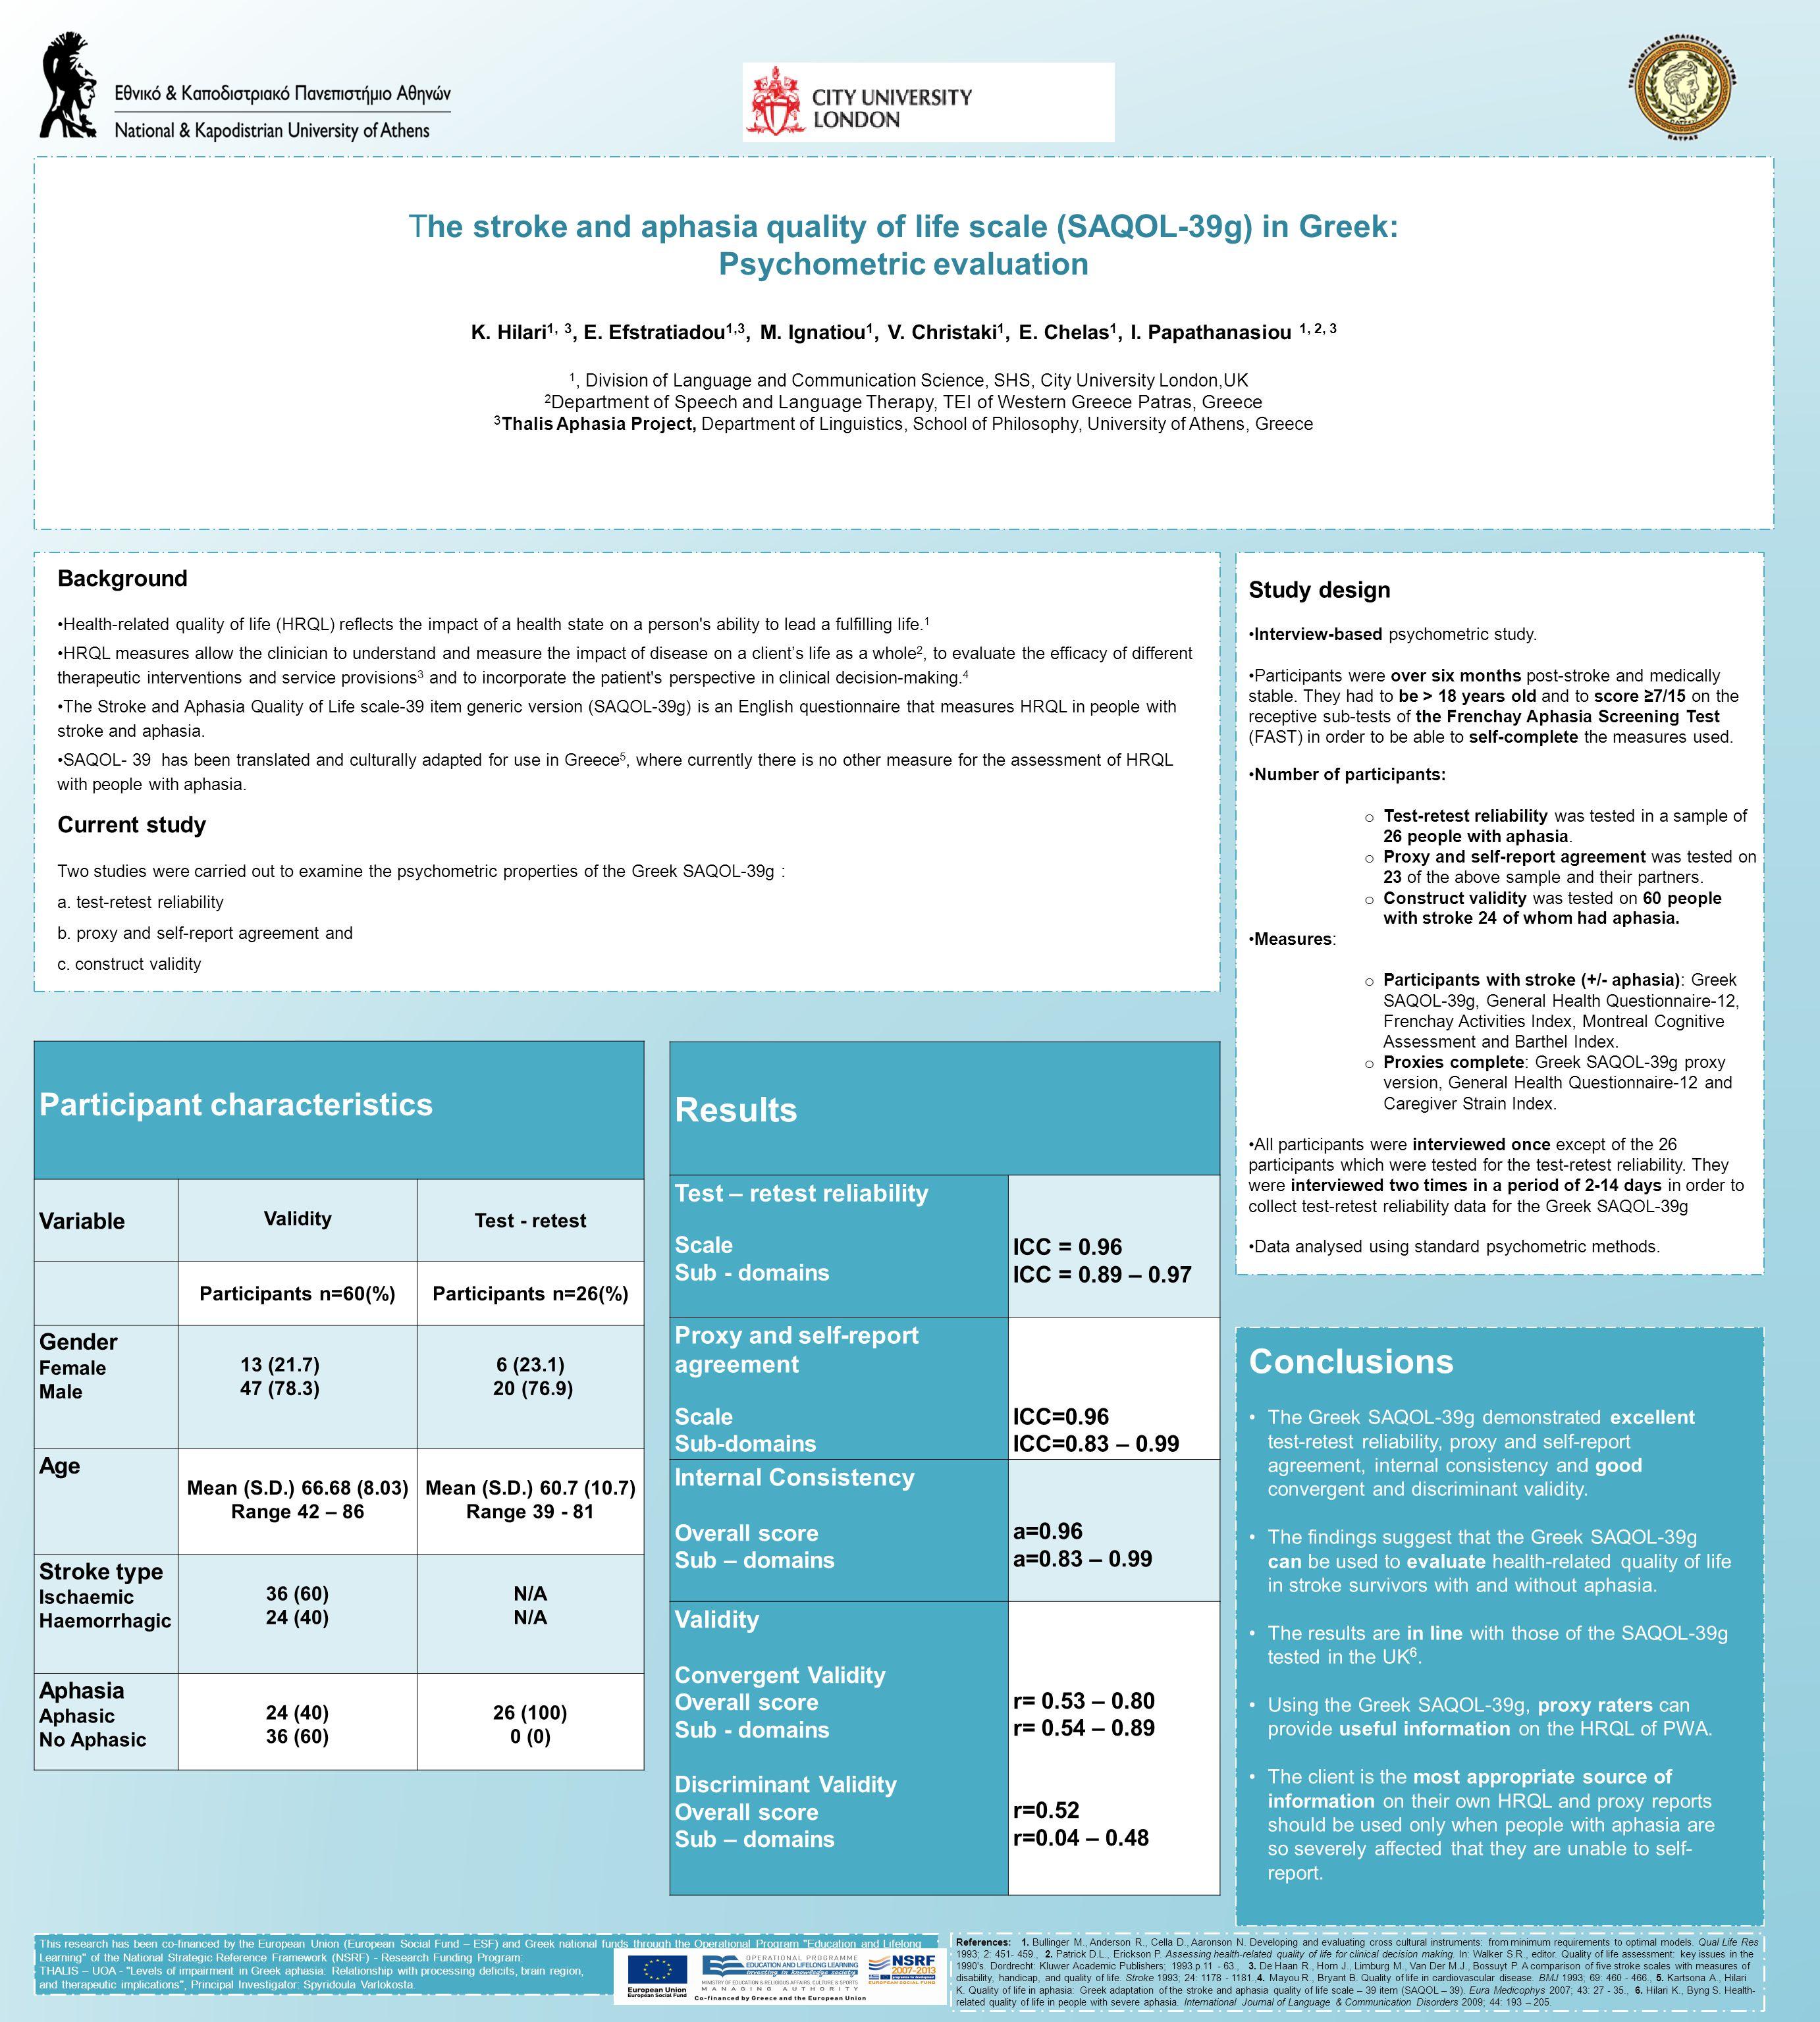 The stroke and aphasia quality of life scale (SAQOL-39g) in Greek: Psychometric evaluation K. Hilari 1, 3, E. Efstratiadou 1,3, M. Ignatiou 1, V. Chri